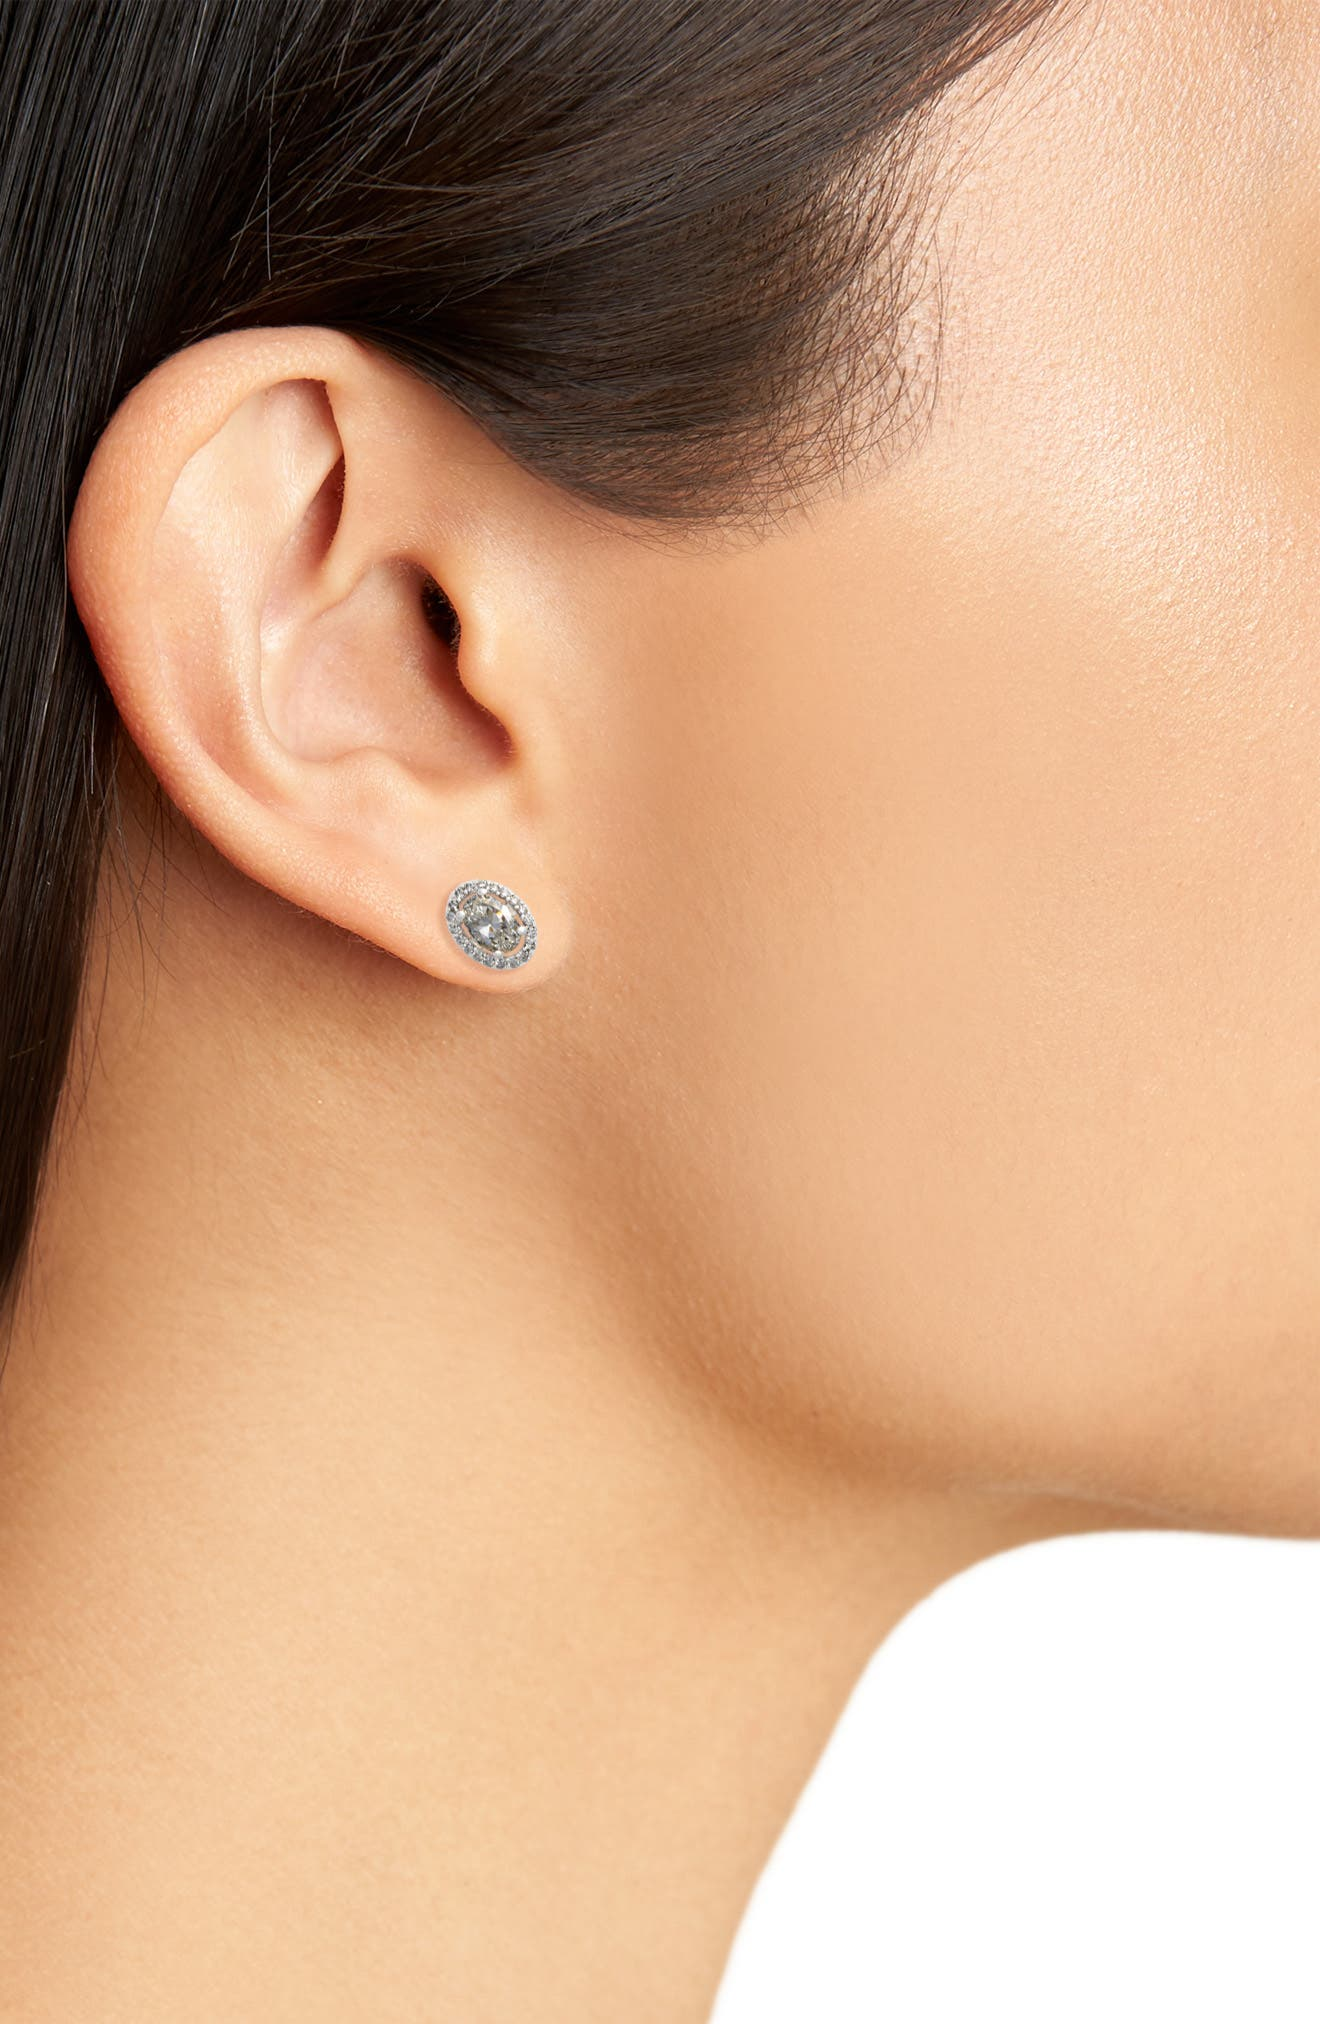 Simulated Diamond Stud Earrings,                             Alternate thumbnail 2, color,                             SILVER/ CLEAR